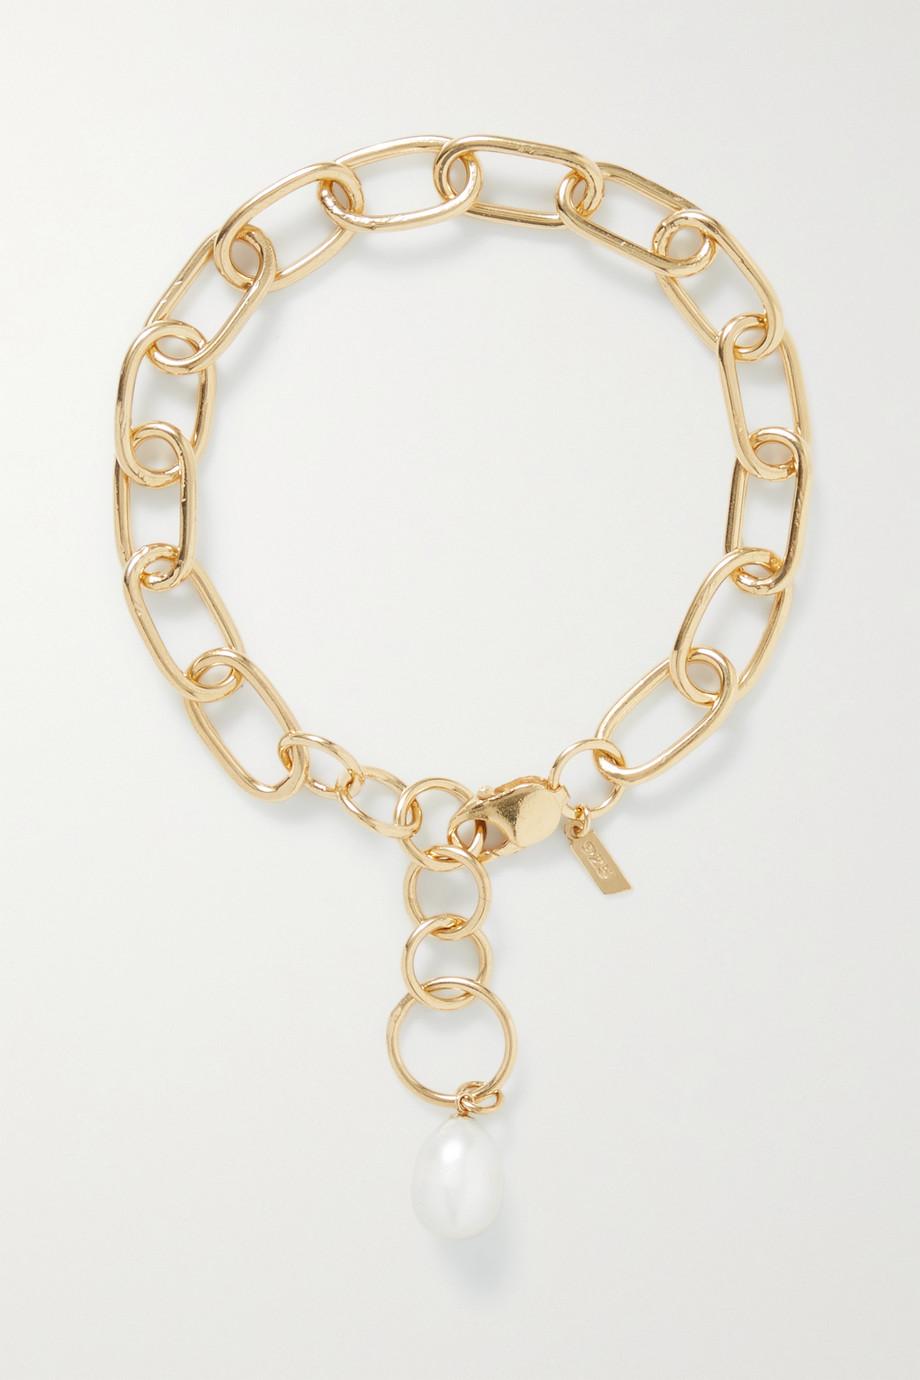 Loren Stewart Industrial XXL gold-plated pearl anklet